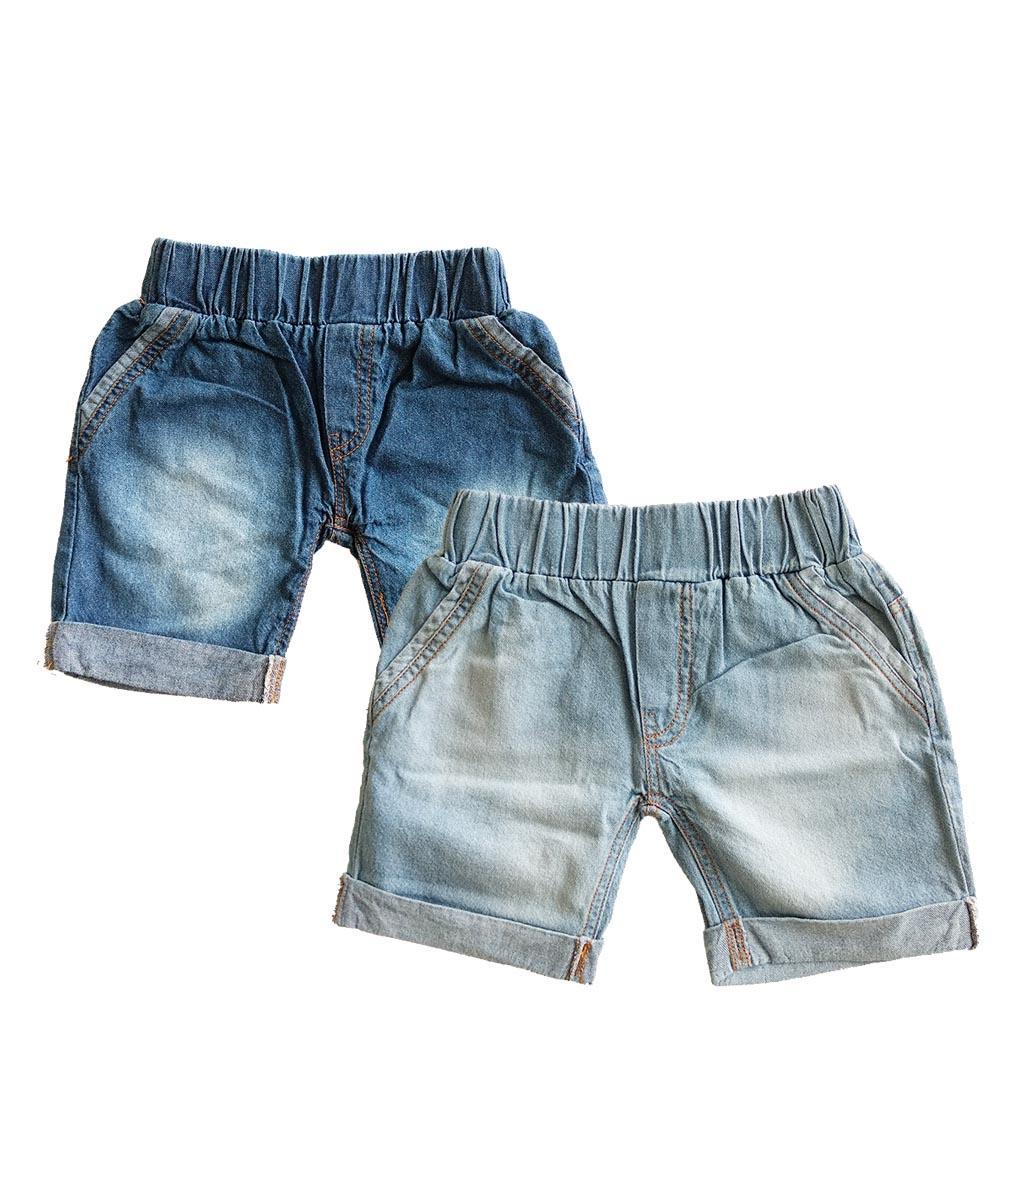 Kazel Jobel Short Jeans Edition Isi 2pcs By Adorababyshop.